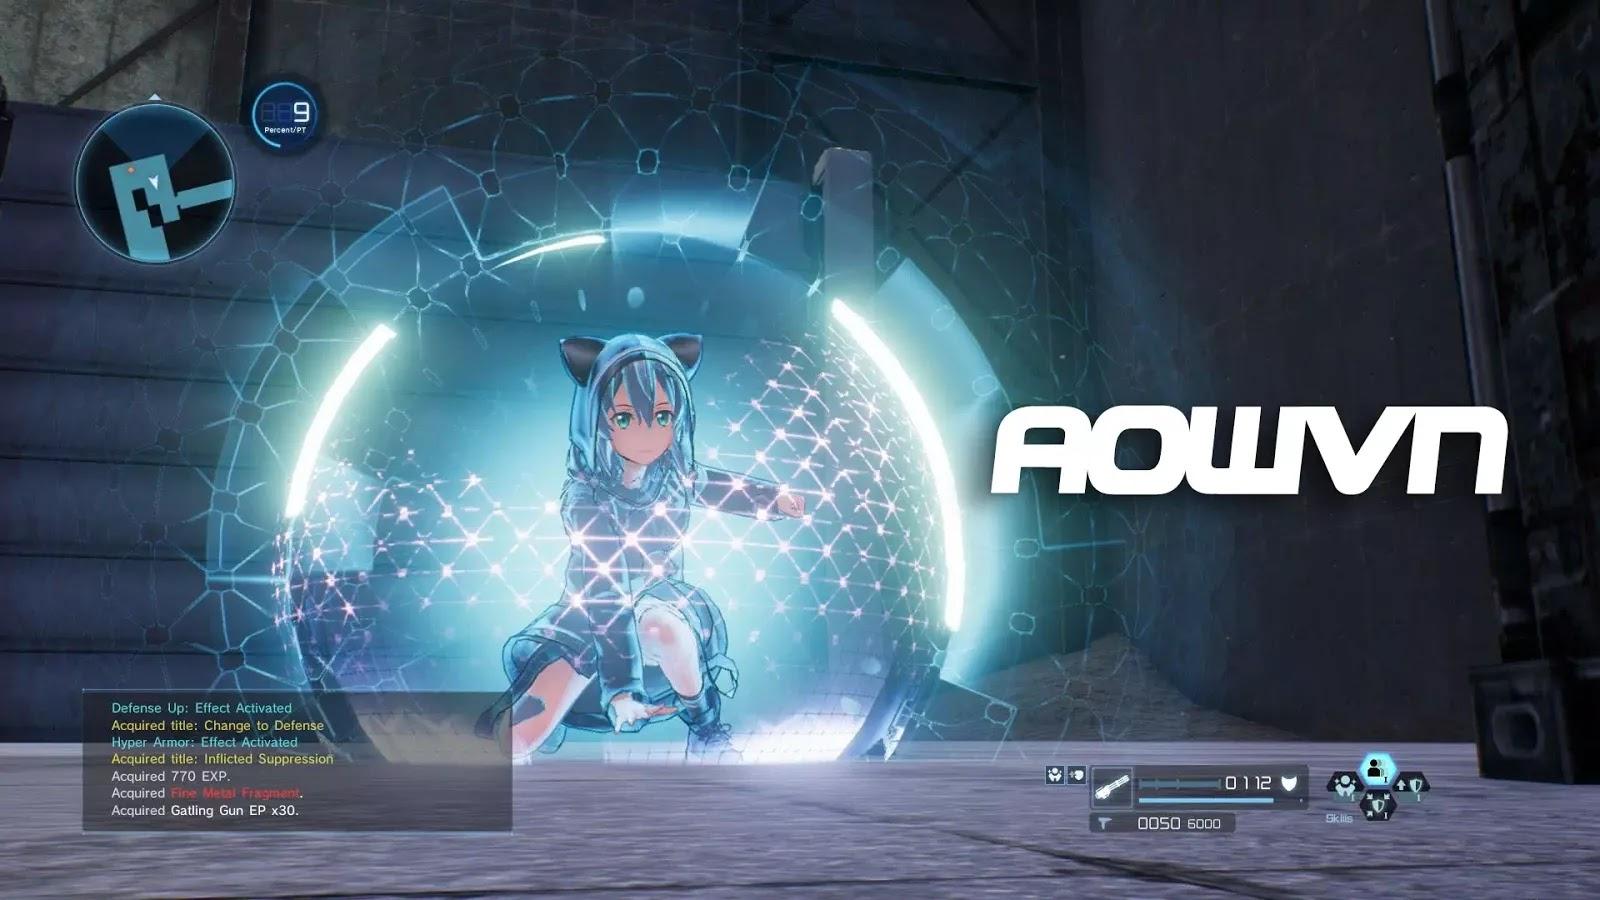 %255B%2BHOT%2B%255D%2BGame%2B%2BSword%2BArt%2BOnline%2BFatal%2BBullet%2B%2BPC%2B %2BGame%2BAnime%2BS%2B.A%2B.O%2B%25284%2529 - [ HOT ] Game : Sword Art Online: Fatal Bullet | PC - Game Anime S .A .O